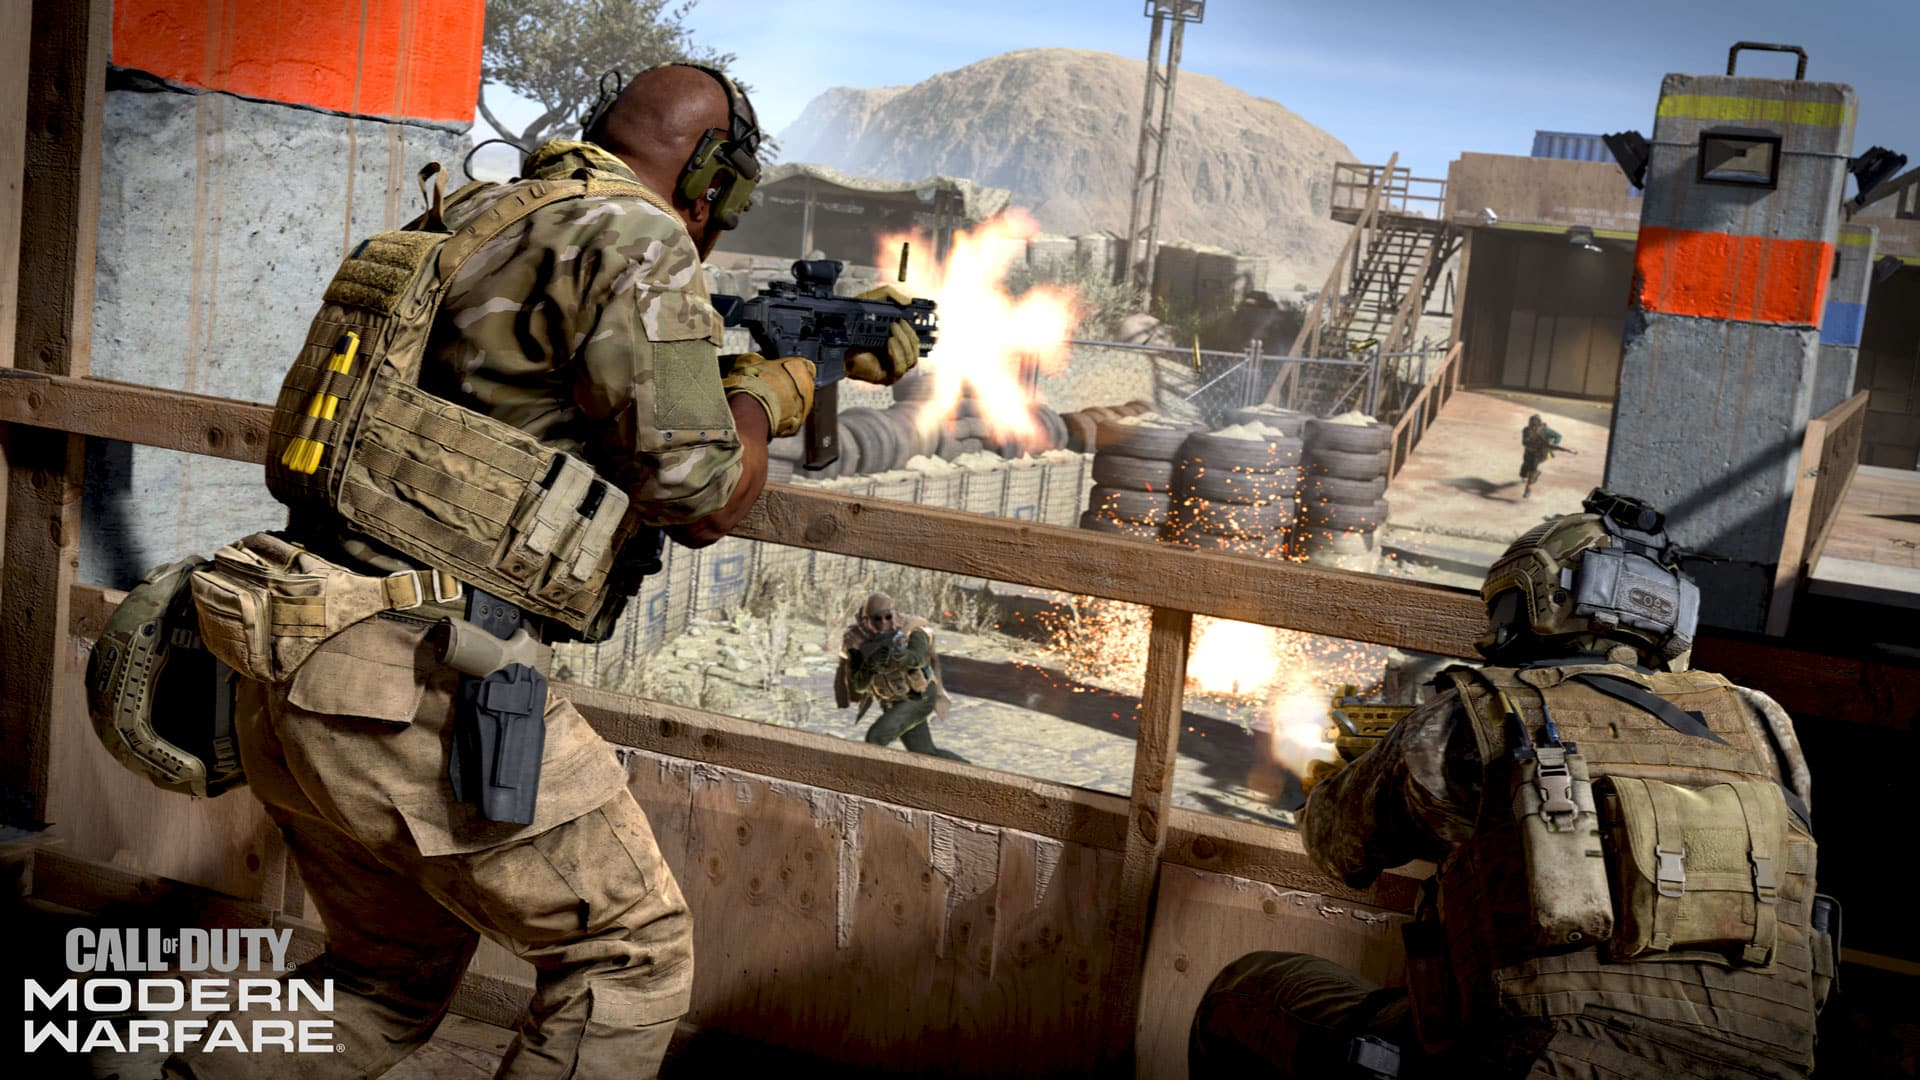 Call of Duty Modern Warfare Multiplayer Alpha free on PS4